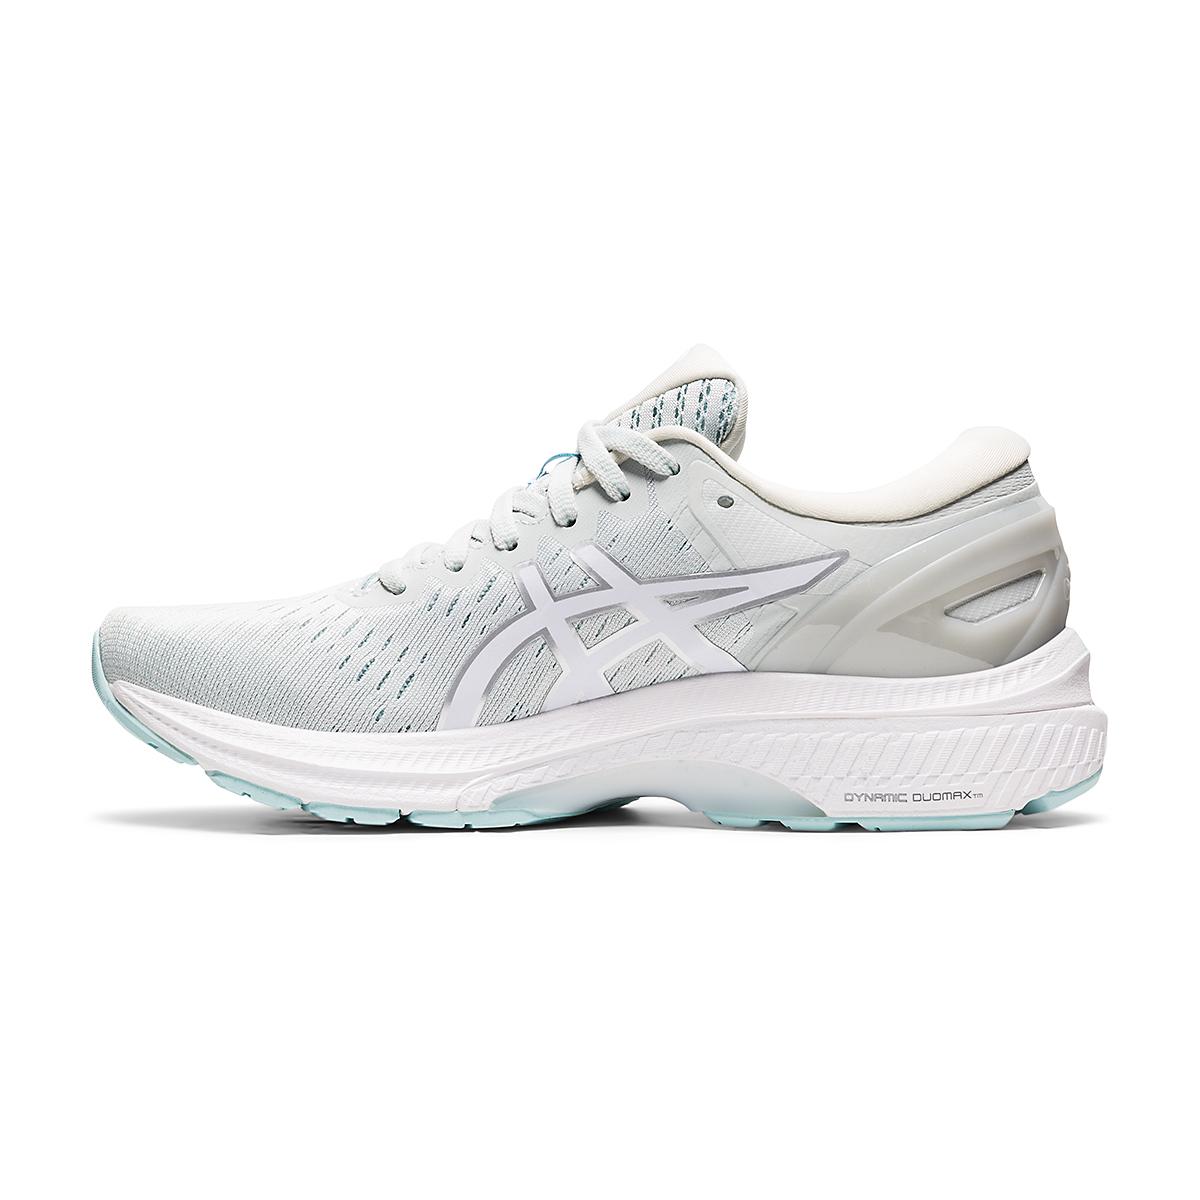 Women's Asics GEL-Kayano 27 Running Shoe - Color: Glacier Grey/White - Size: 6 - Width: Regular, Glacier Grey/White, large, image 2